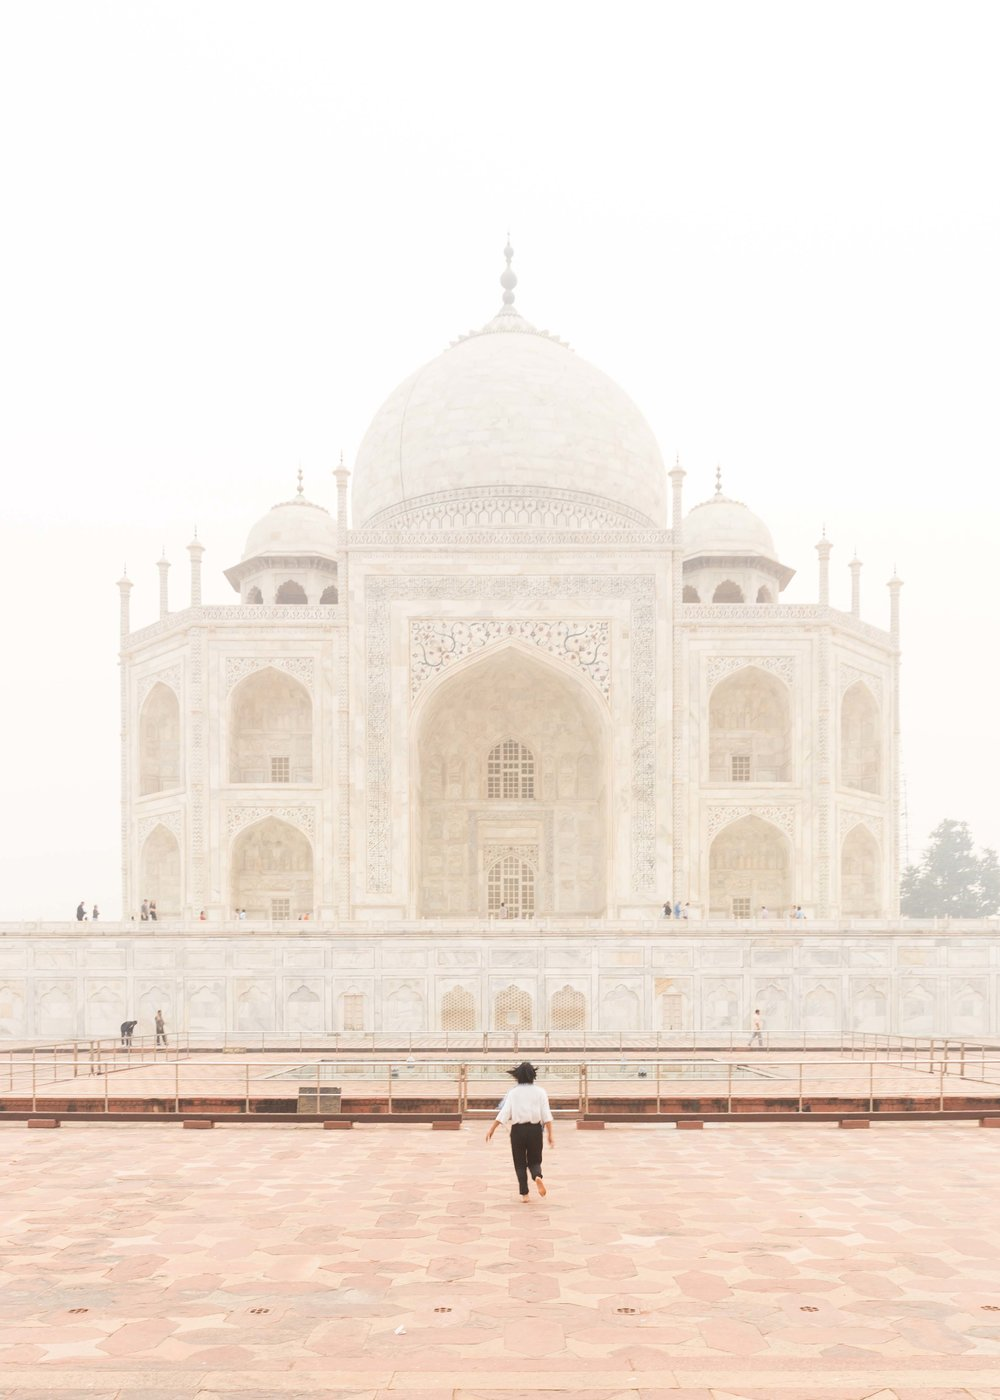 travel_photography_taj_mahal_india.jpg